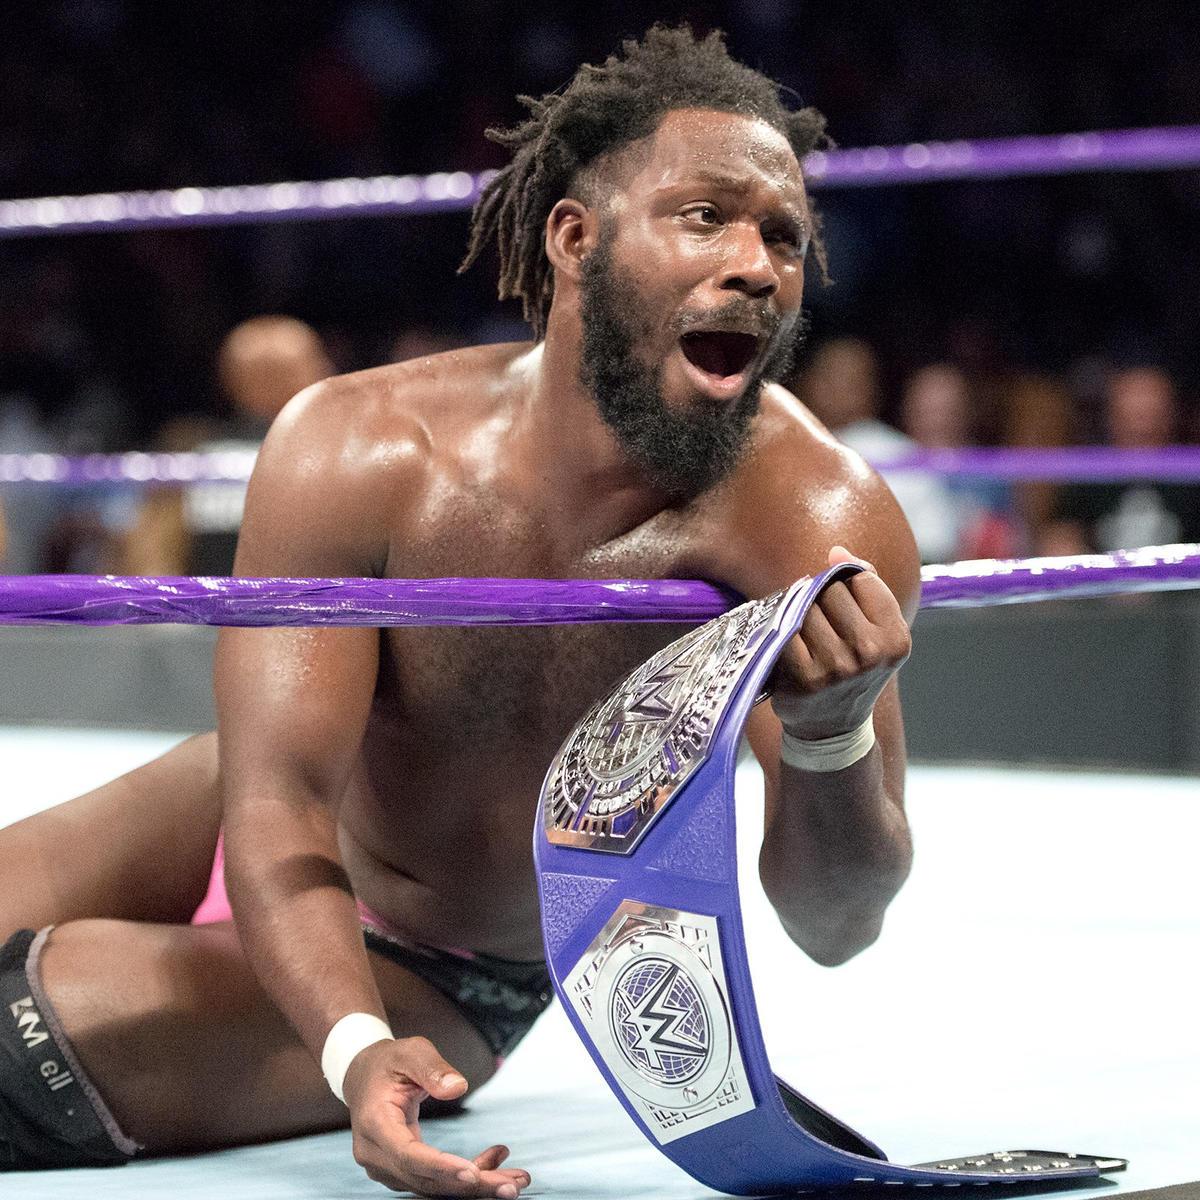 RIch Swann wins Cruiserweight Championship: WWE 205 Live, Nov. 29, 2016